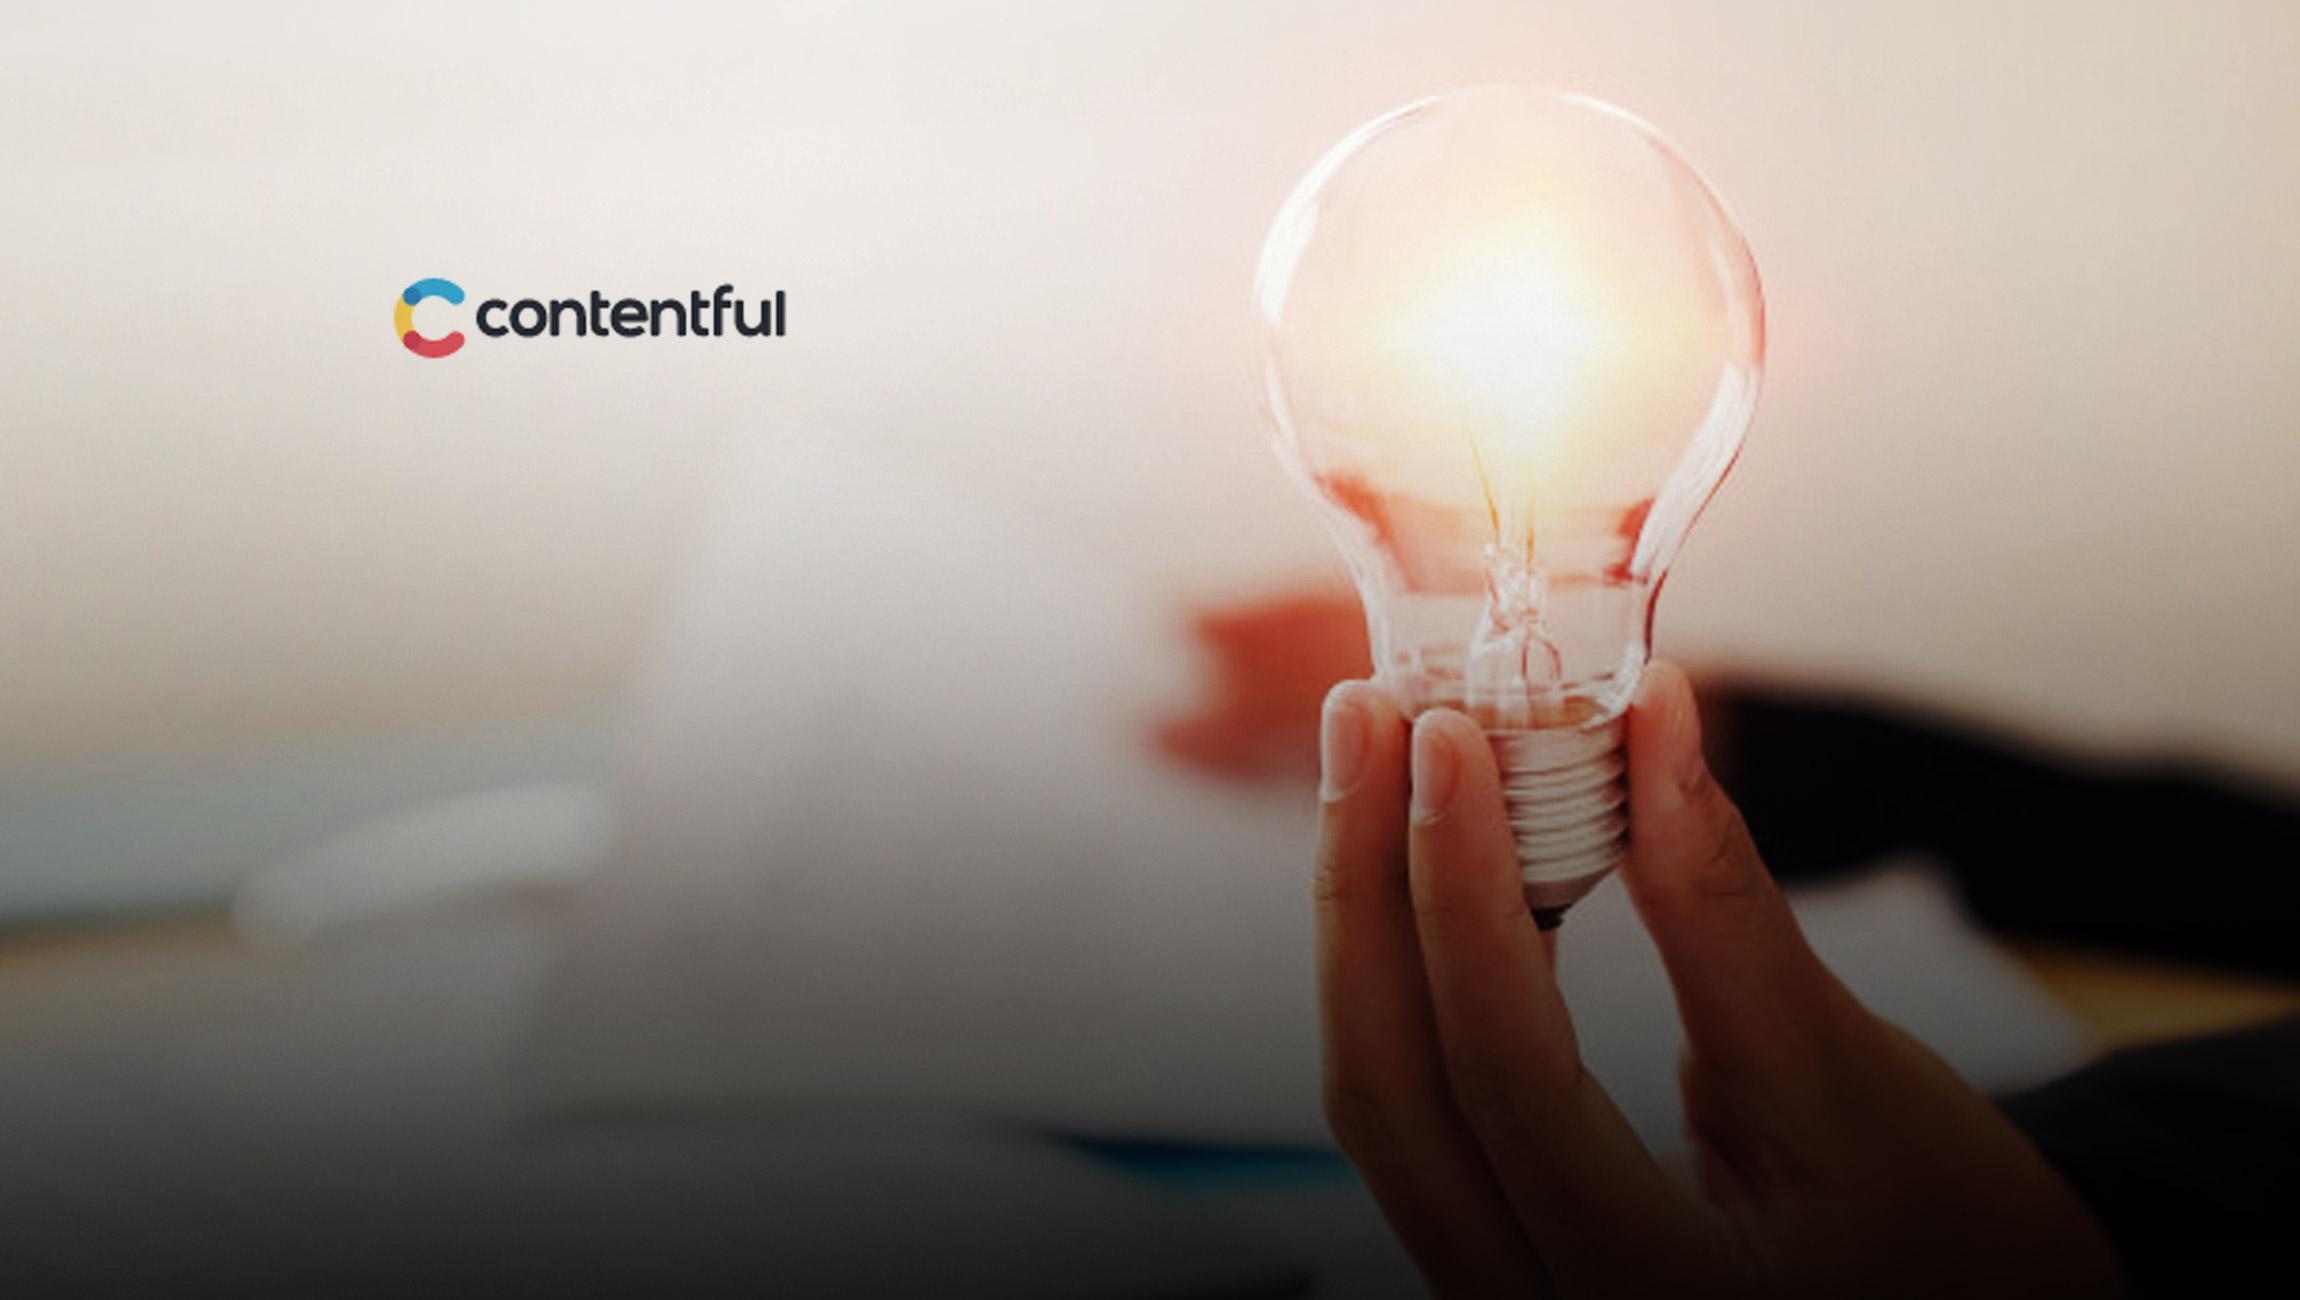 Survey By Contentful Identifies Digital Innovation Gap Between Leaders and Laggards